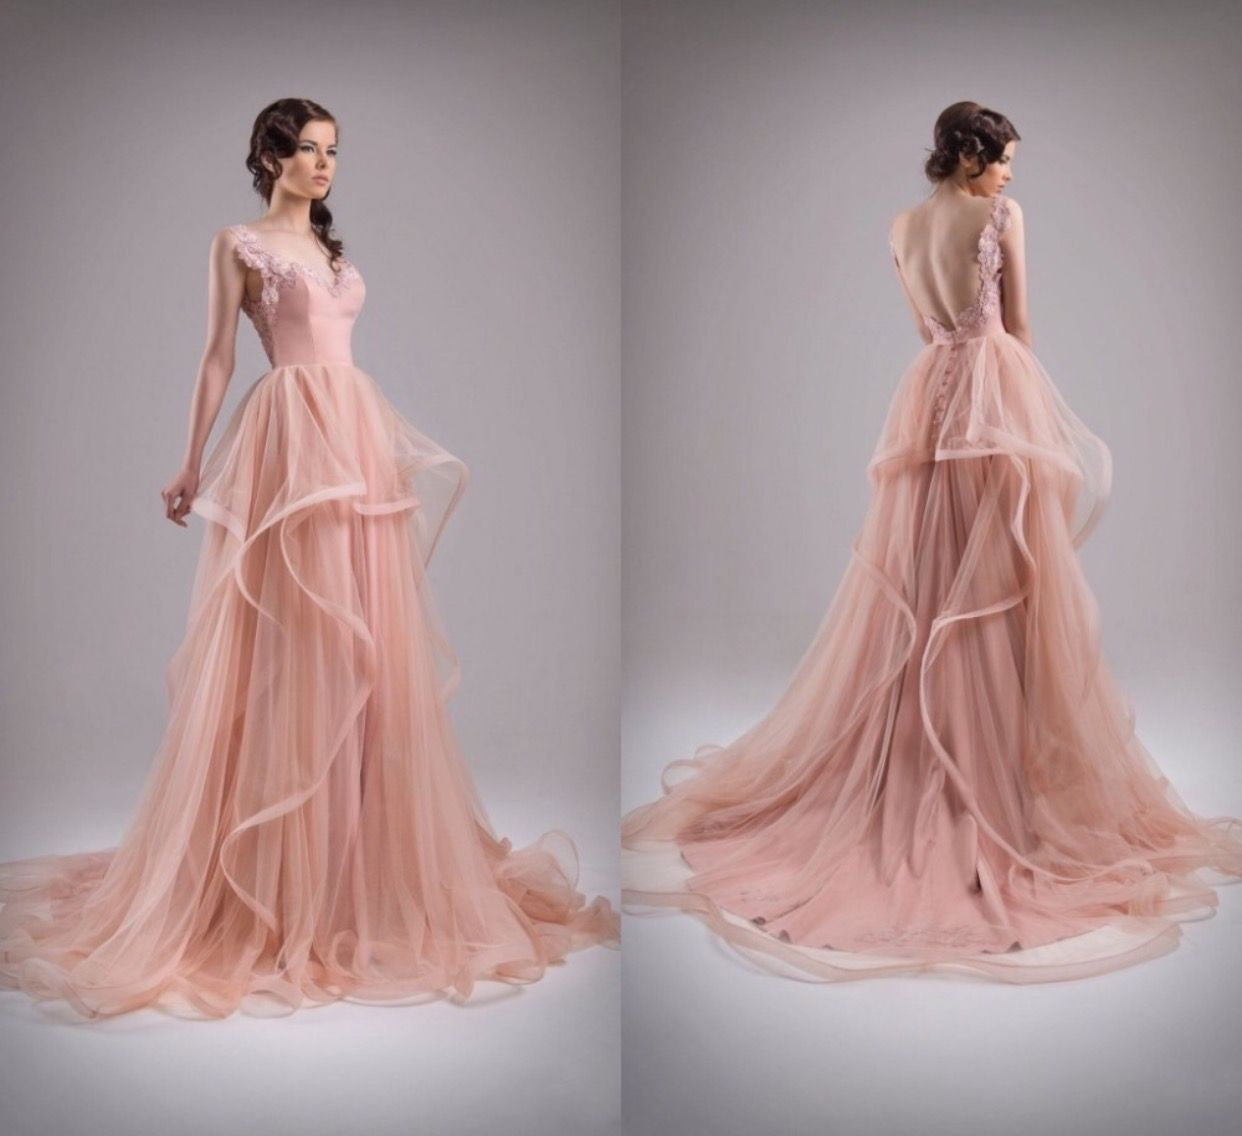 Pin by Alana Cruz on Princess   Pinterest   Sleeved dress